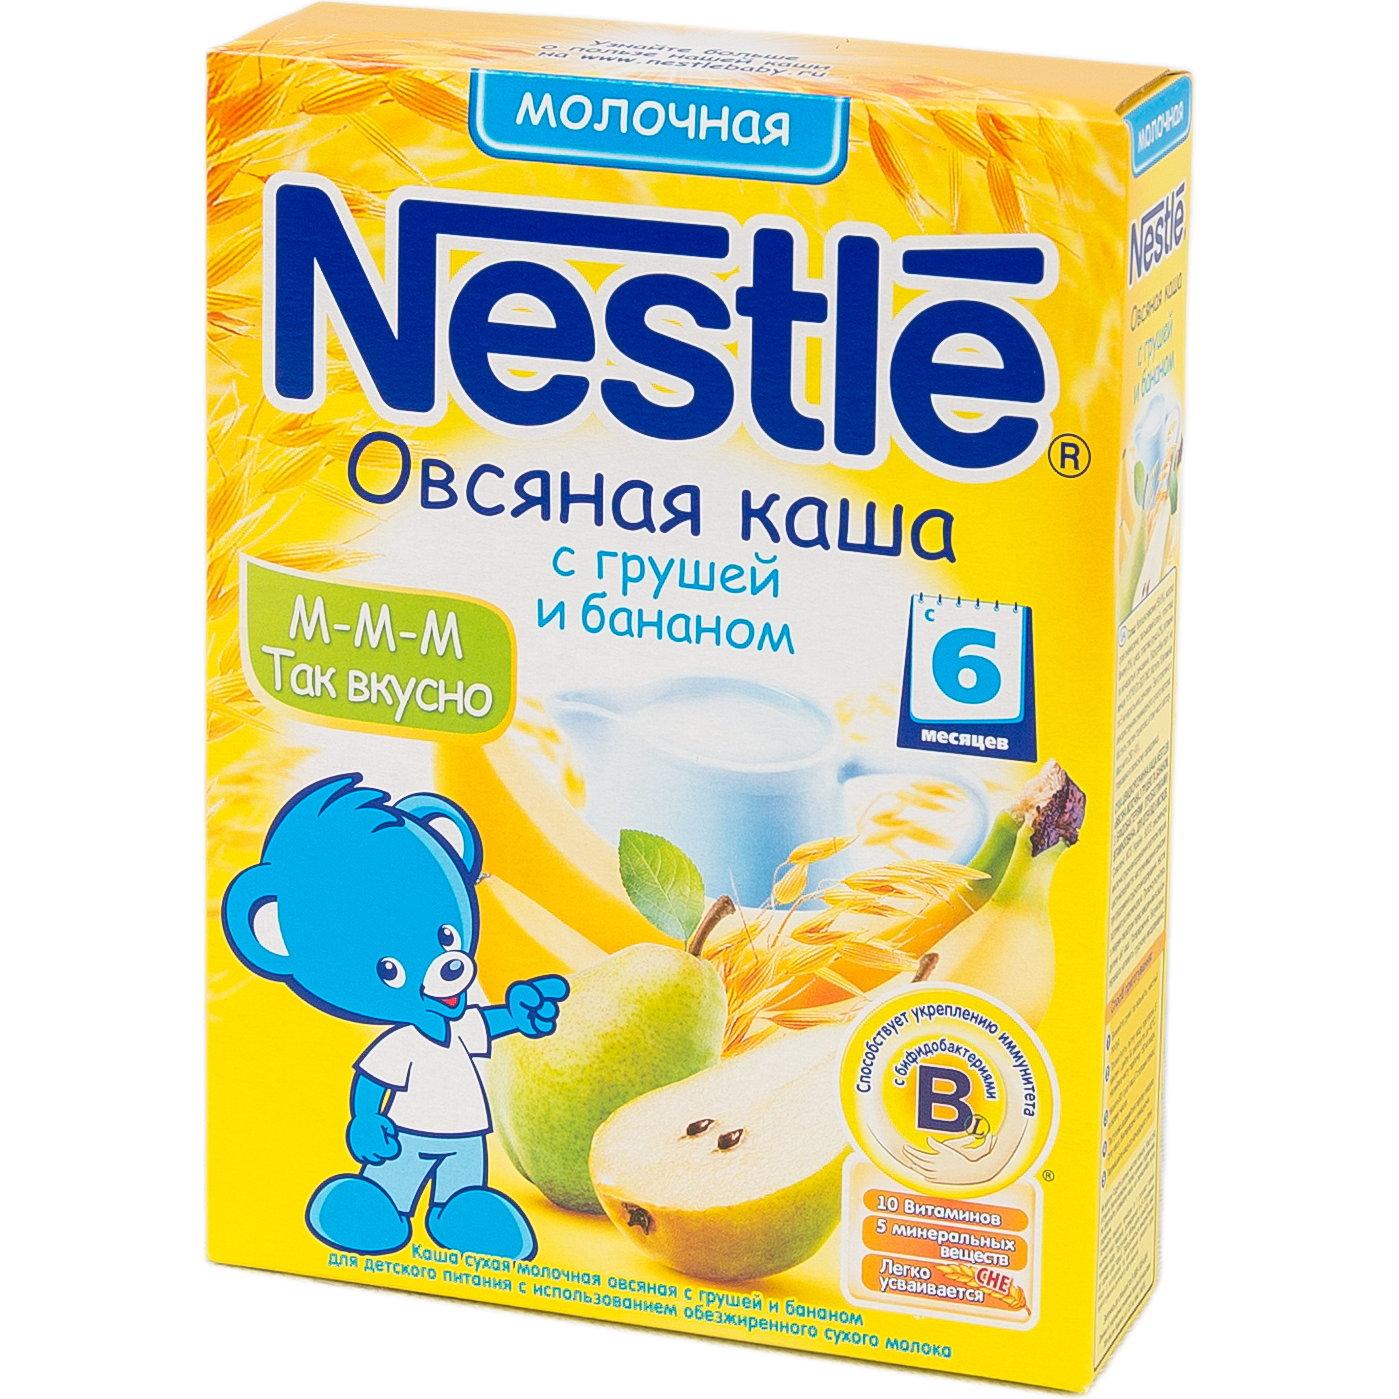 Каша Nestle молочная 250 гр Овсяная с грушей и бананом (с 6 мес)<br>